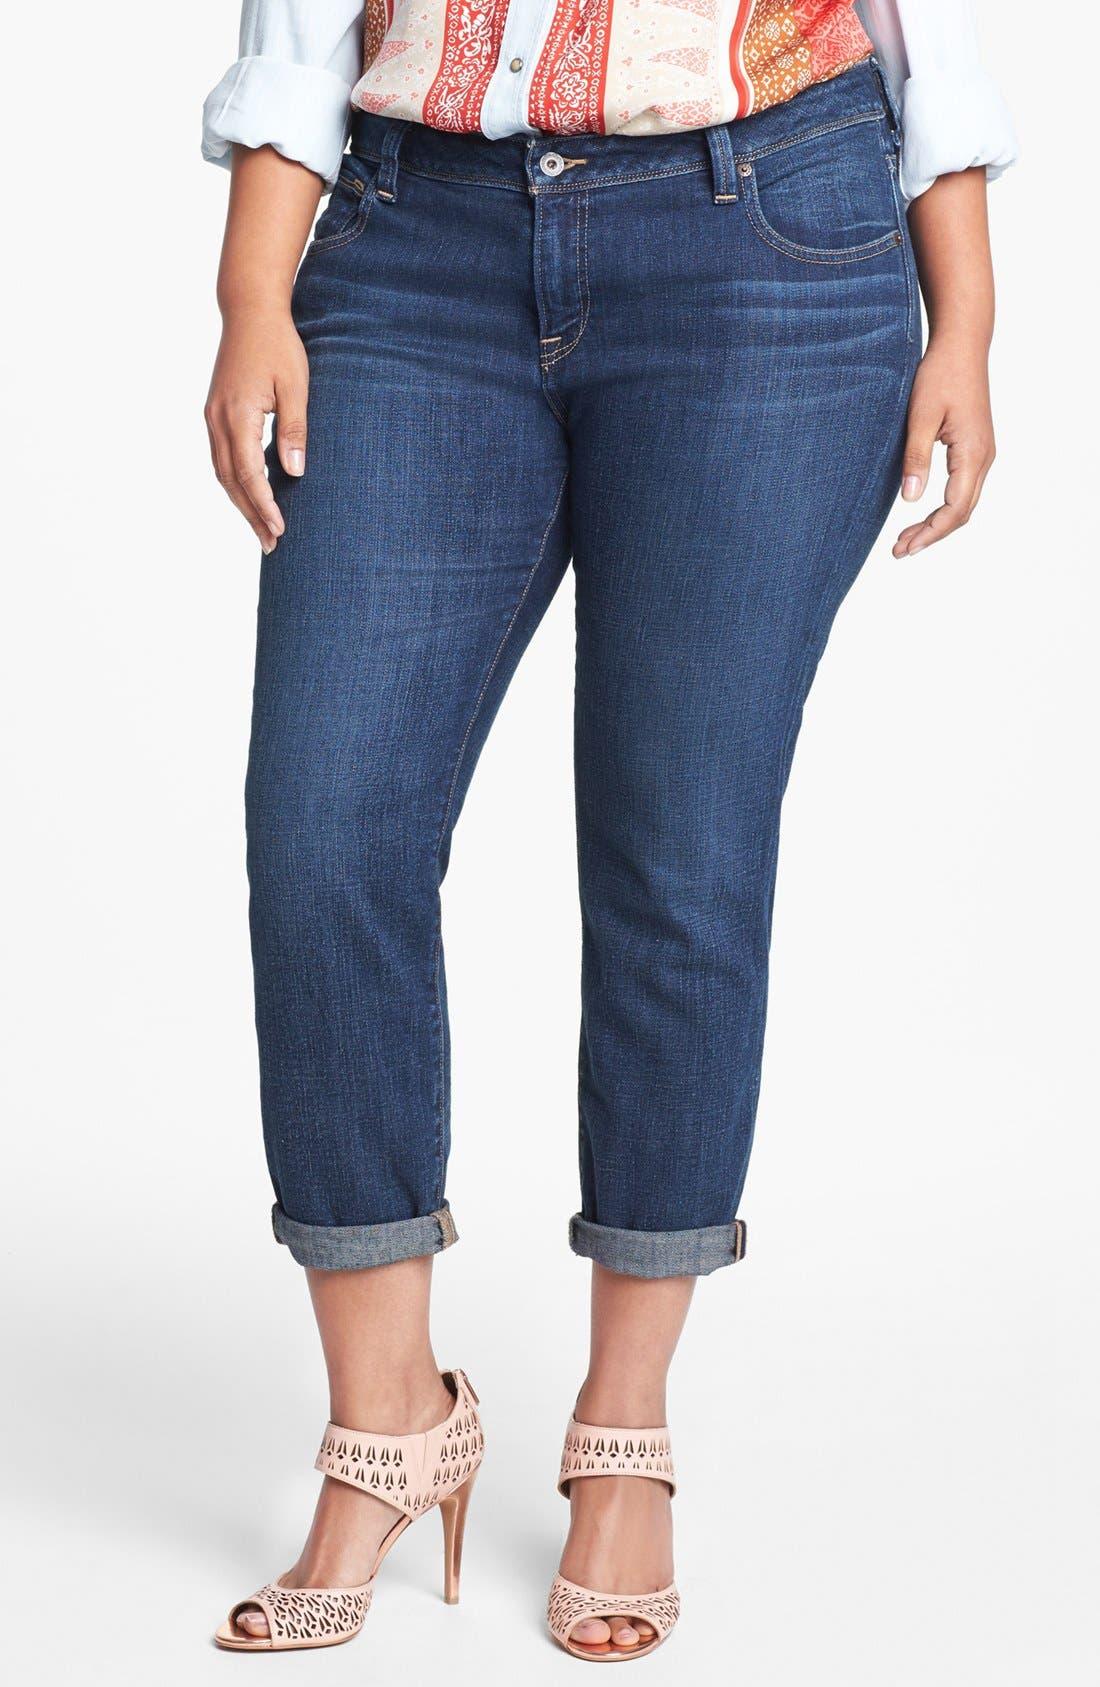 Alternate Image 1 Selected - Lucky Brand 'Georgia' Boyfriend Jeans (Plus Size)